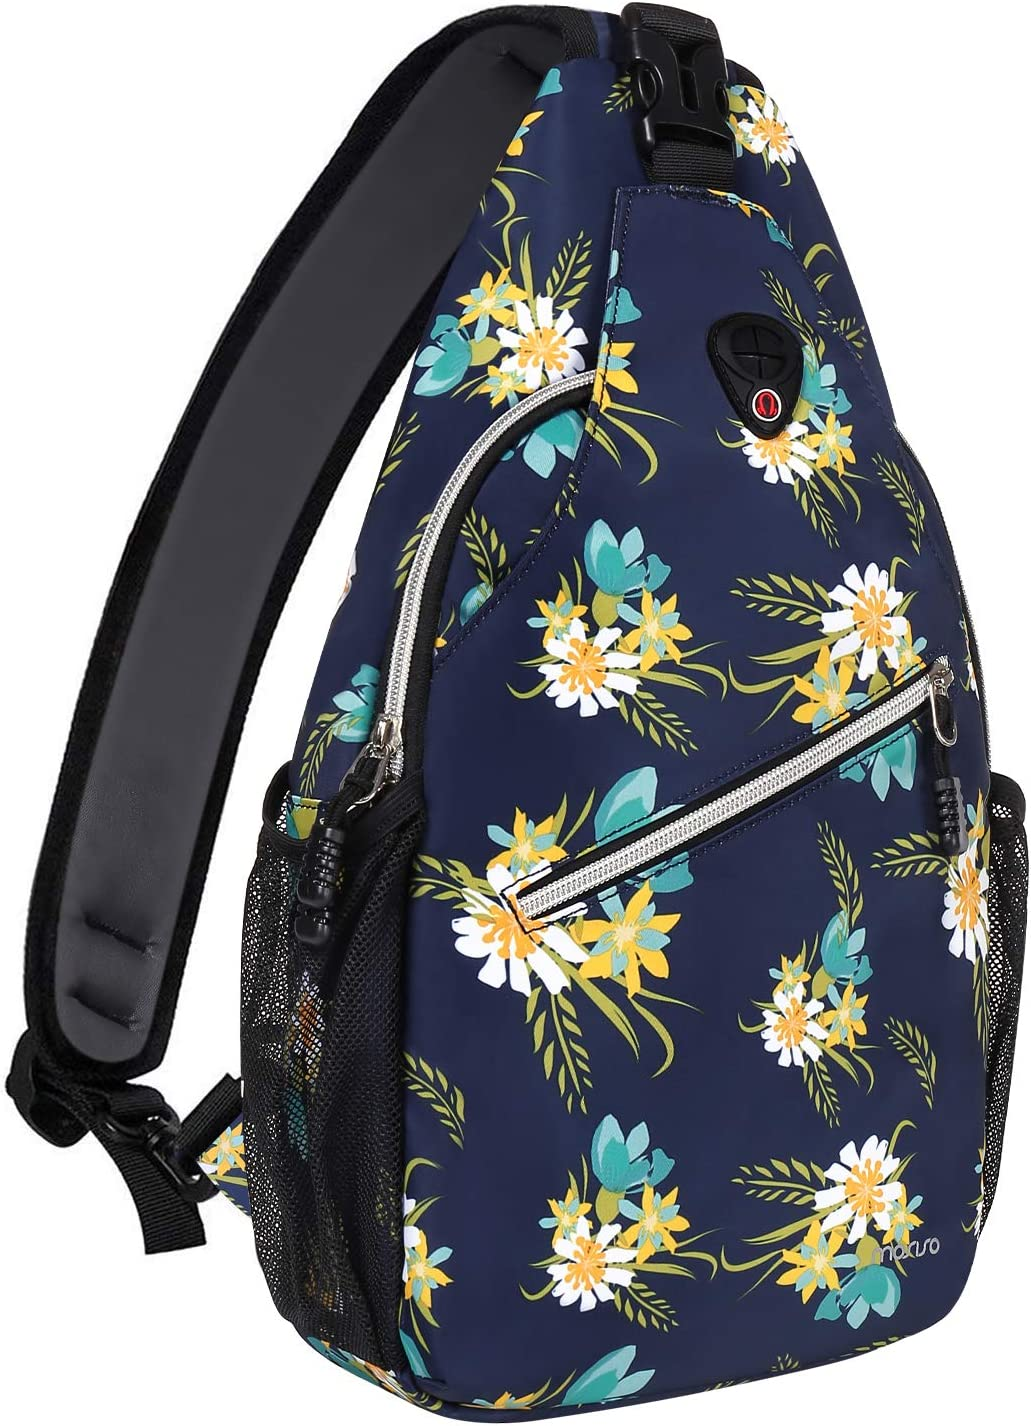 MOSISO Ranking TOP14 Sling Backpack Travel Hiking Rope Very popular Crossbo Daypack Pattern